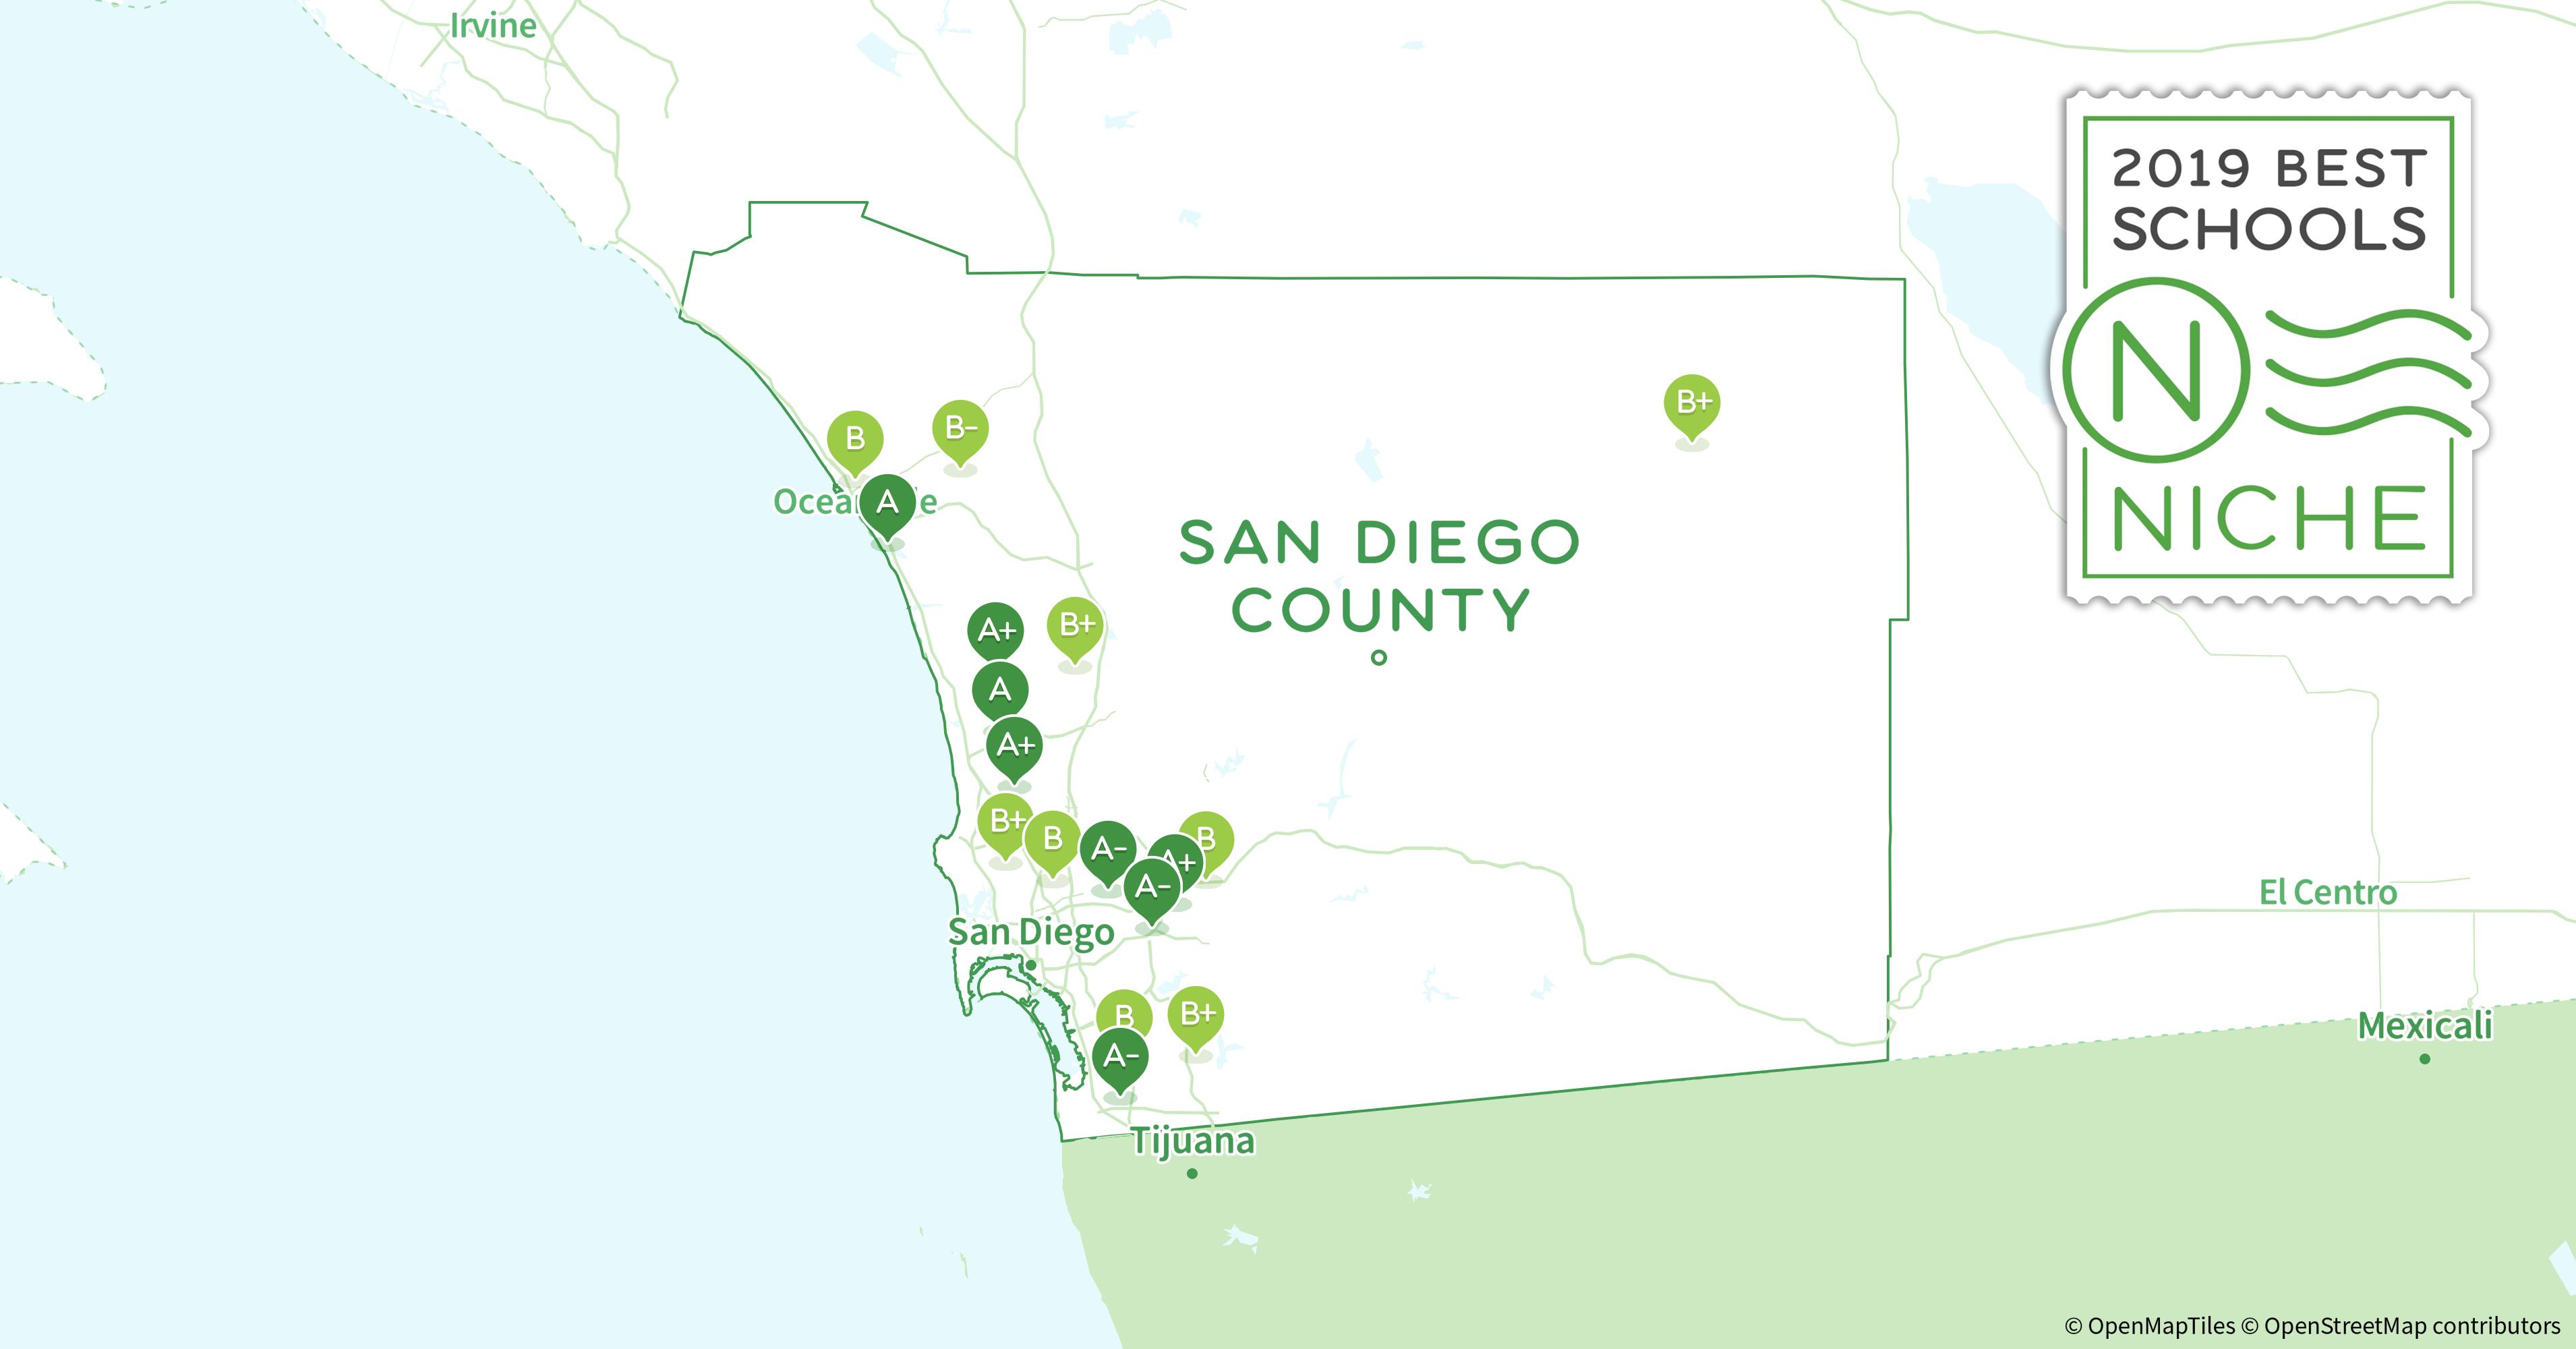 2019 Best Public High Schools In San Diego County Ca Niche